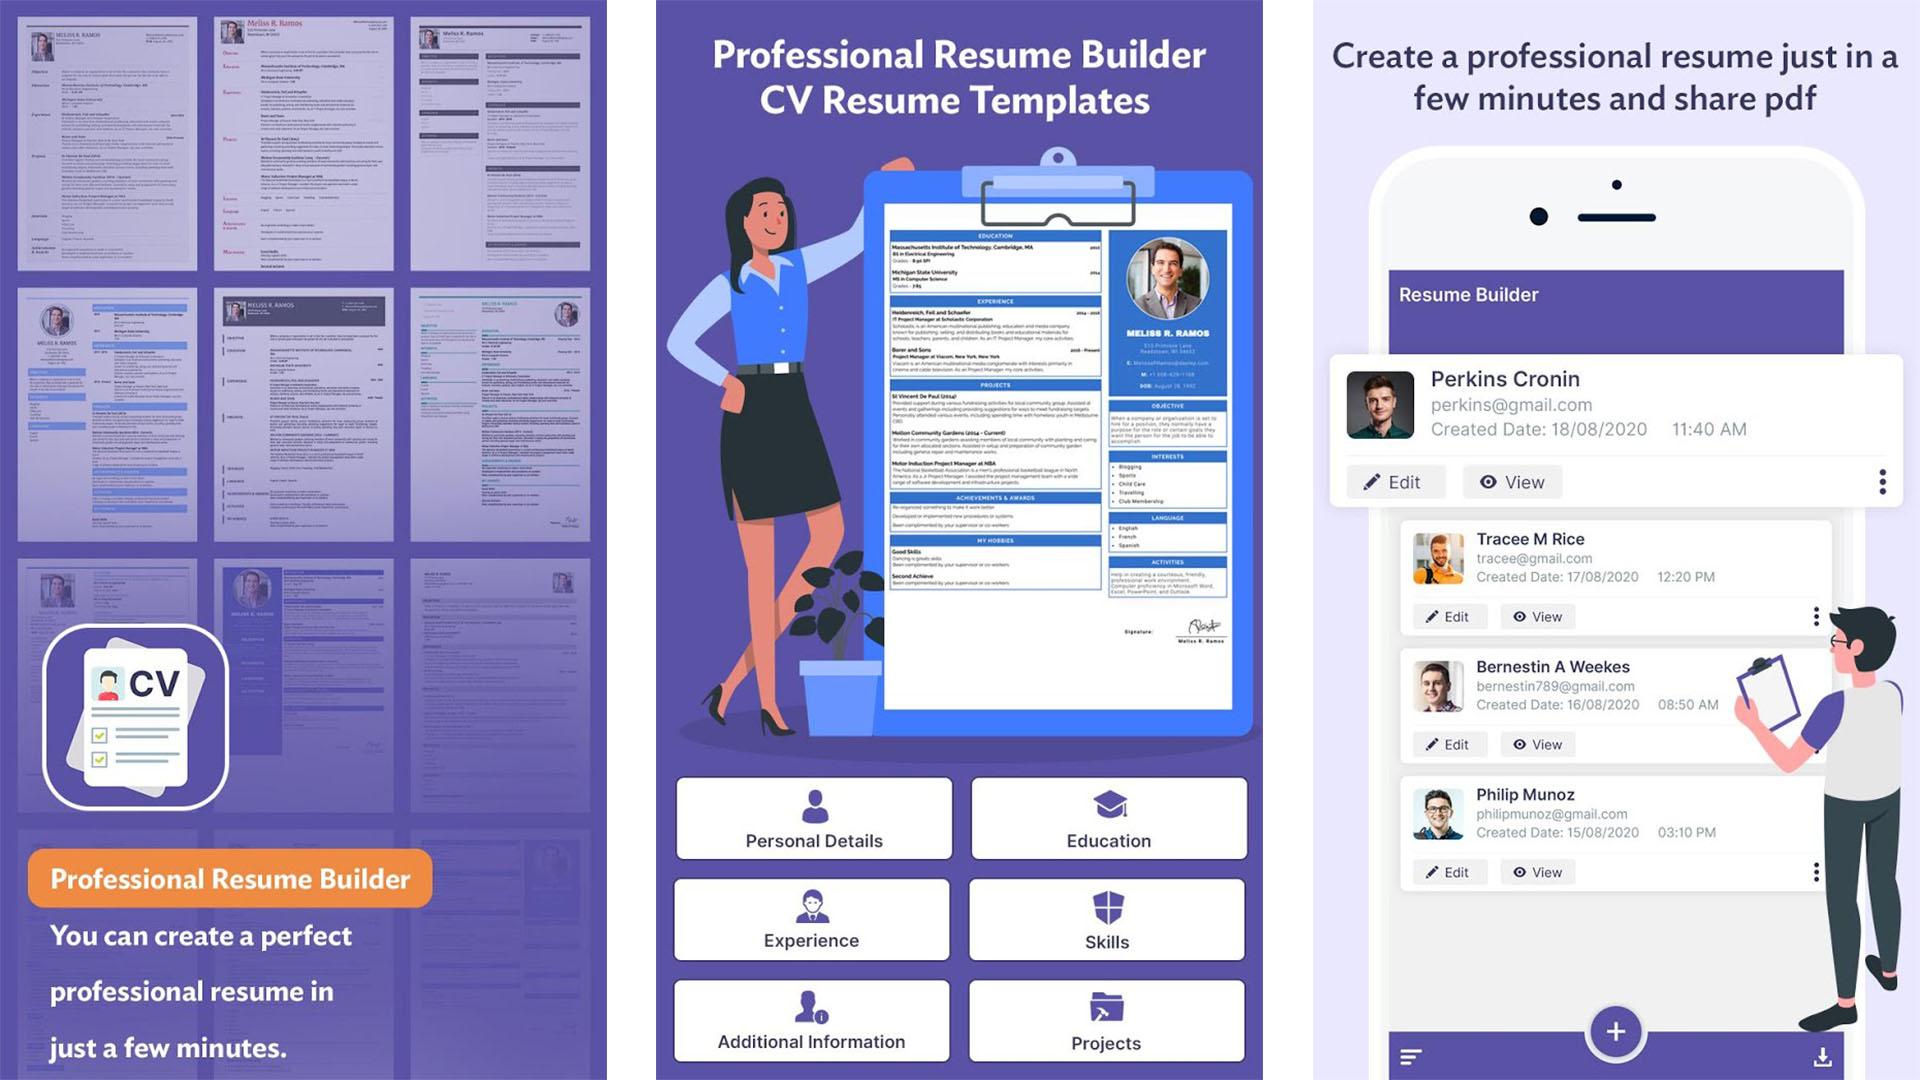 Professional Resume Builder screenshot 2021